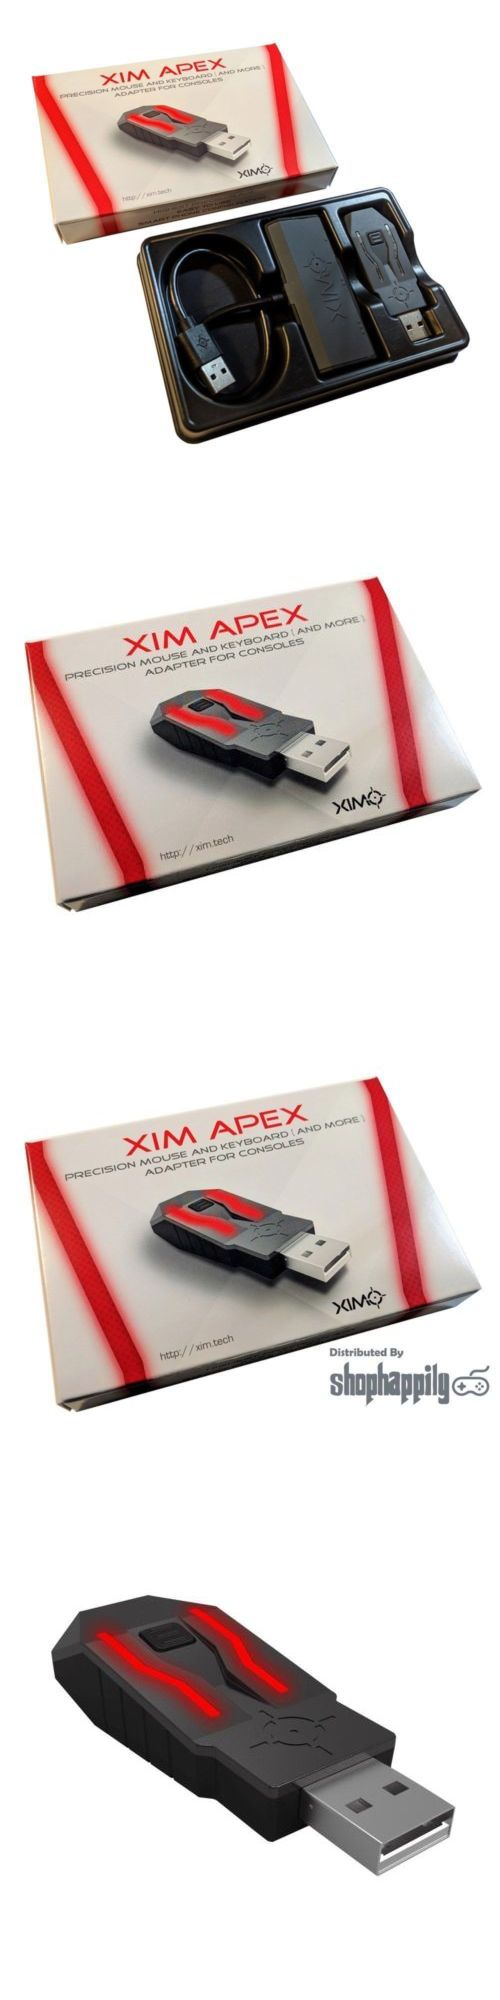 Video Game Accessories 54968: Xim Apex Precison Mouse And